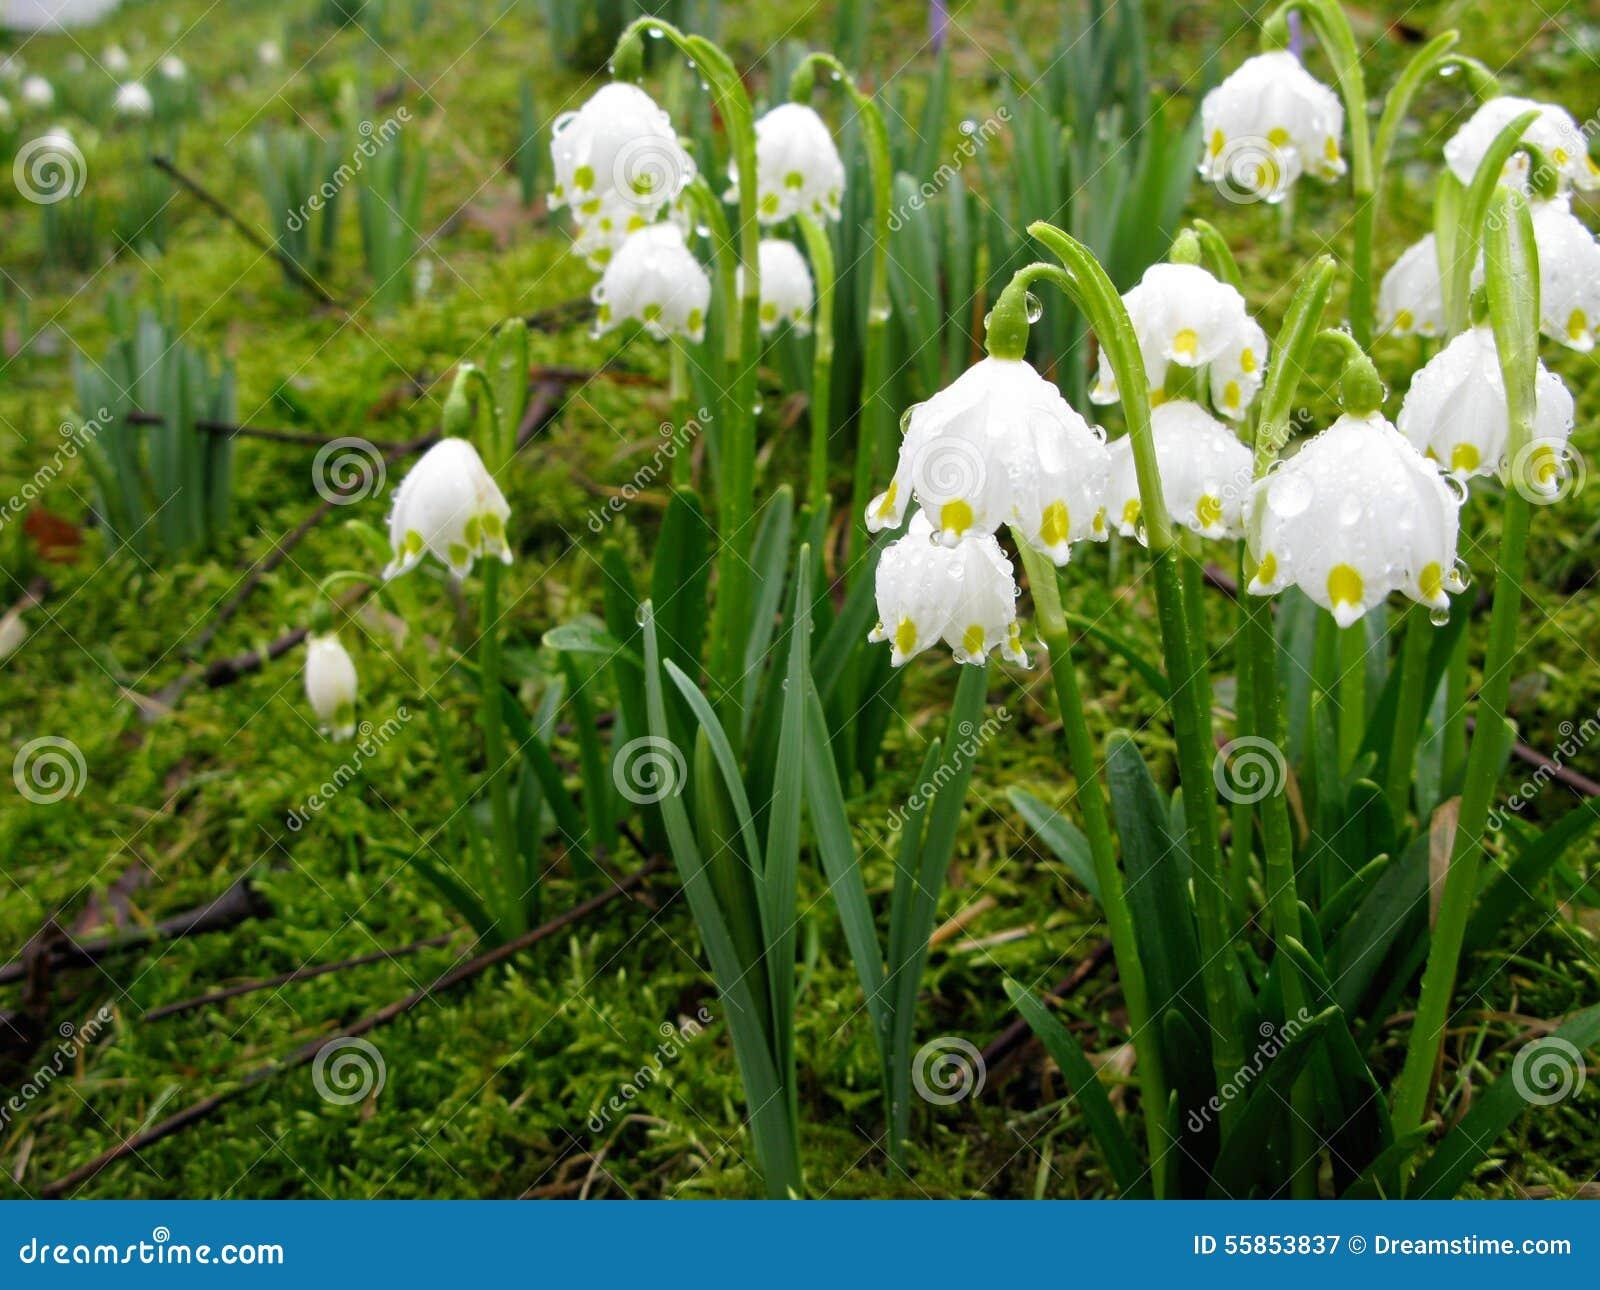 lac fleurs printemps blanches - photo #26